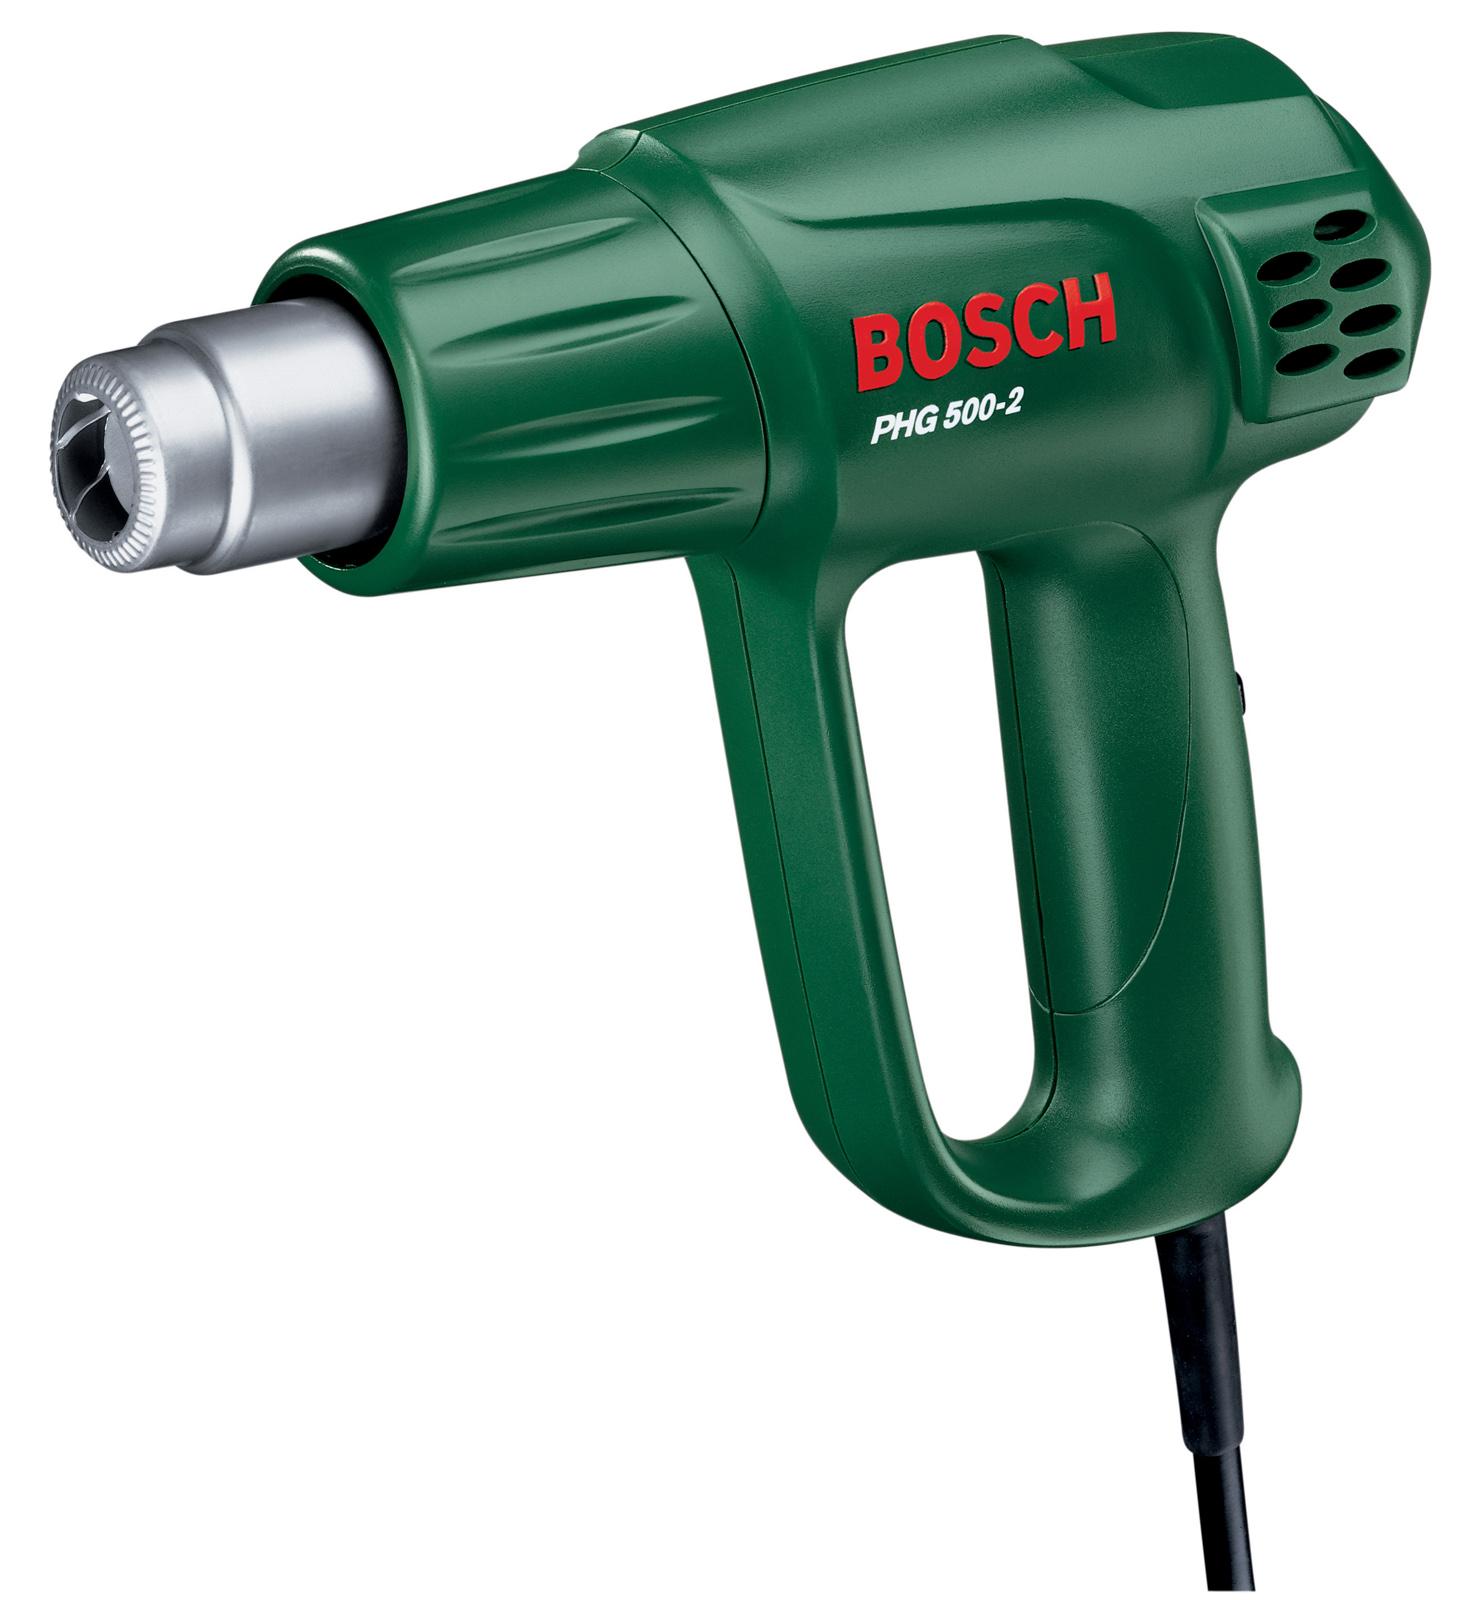 Фен технический Bosch Phg 500-2 (0.603.29a.008) bosch 1600 a 00159